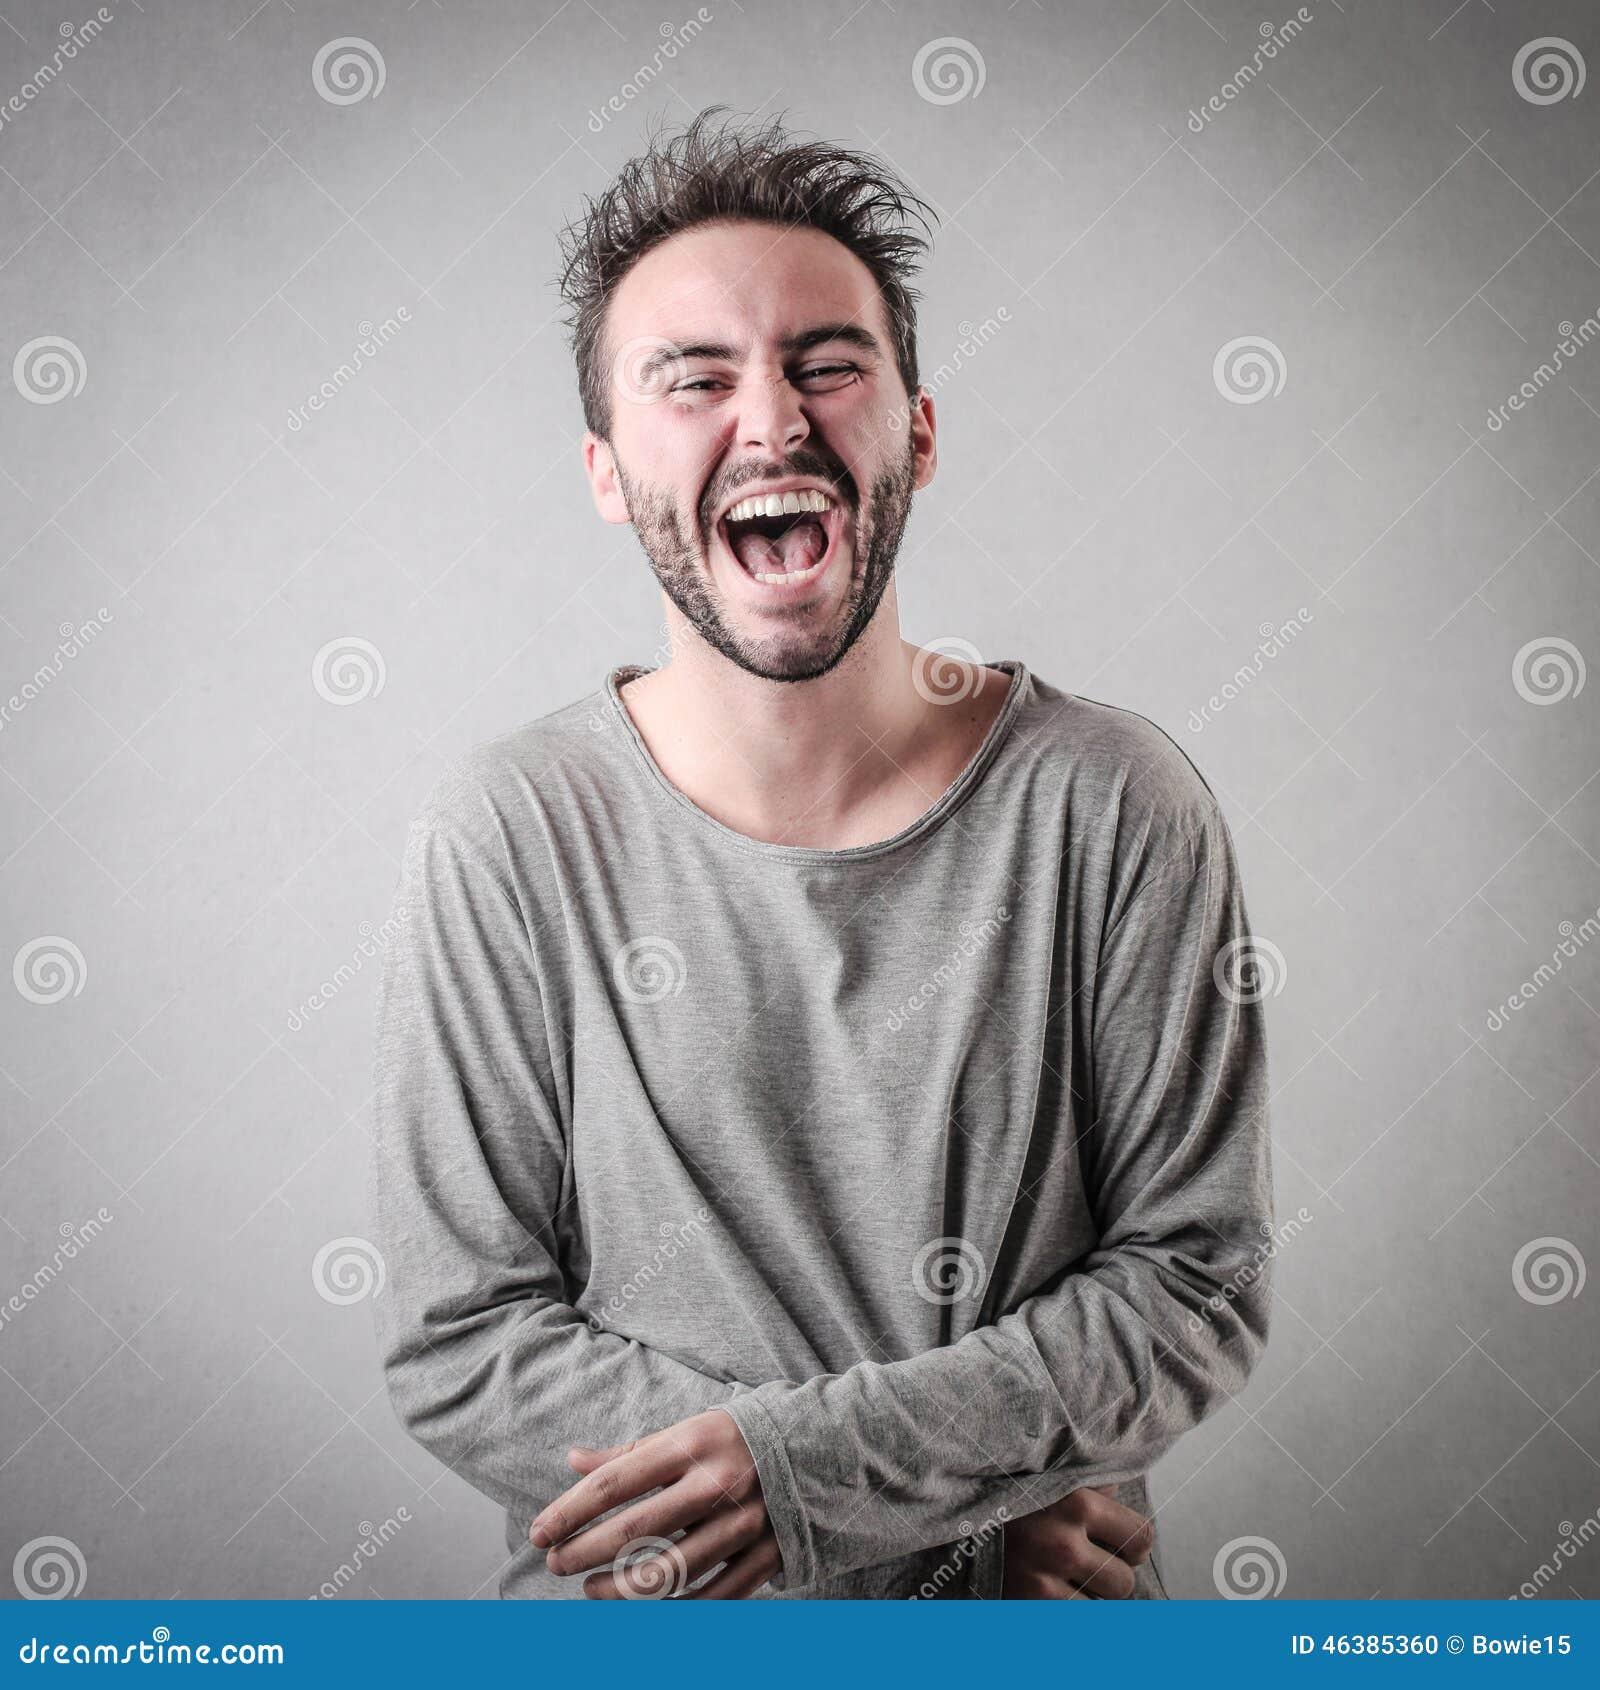 Mens luid lachen uit